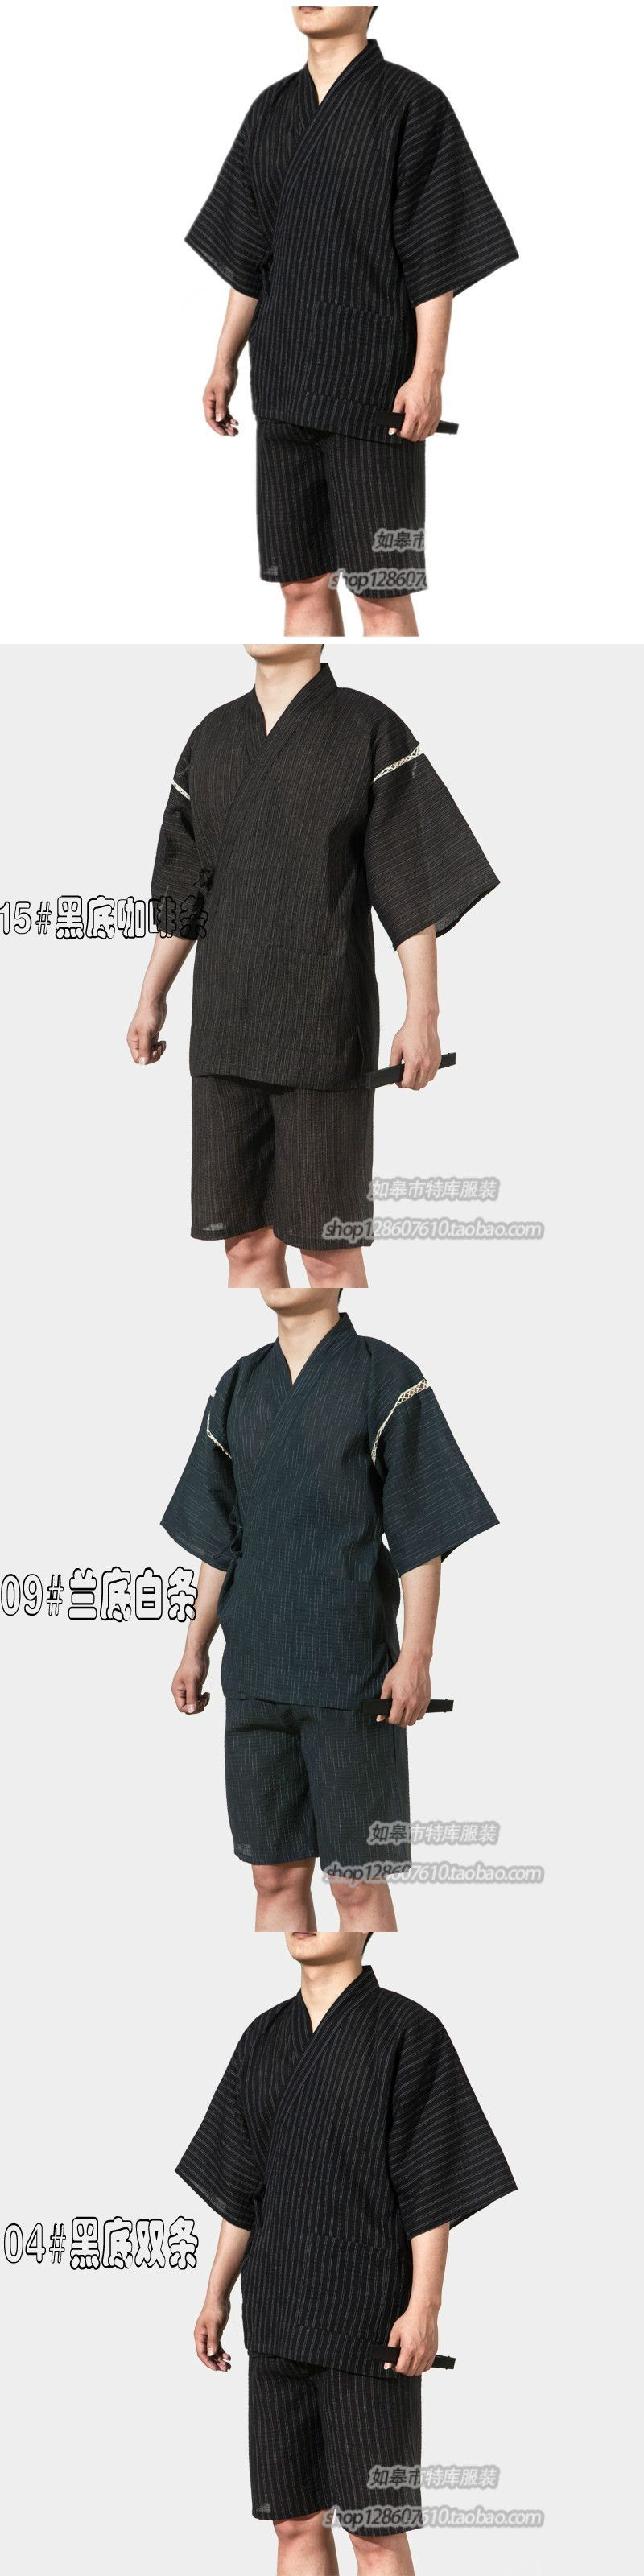 775c1f8d4e 2017 Traditional Japanese Kimonos Men s Japan Cotton Yukata Men s Lounge  Home Clothing Suits Men s Sleepwear Pajamas 062509